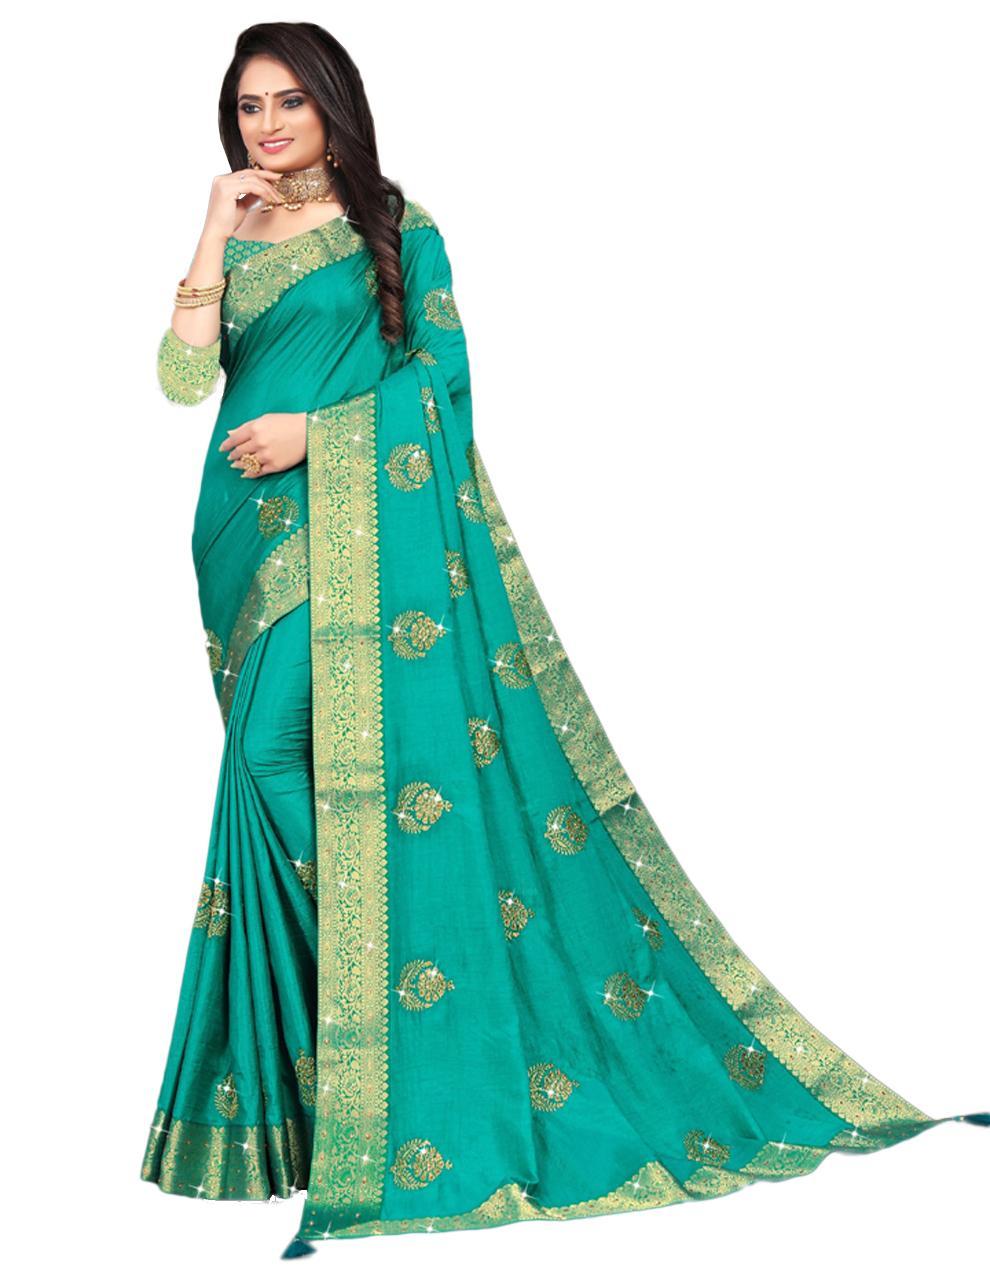 Green Vichitra silk Saree With Blouse IW24394